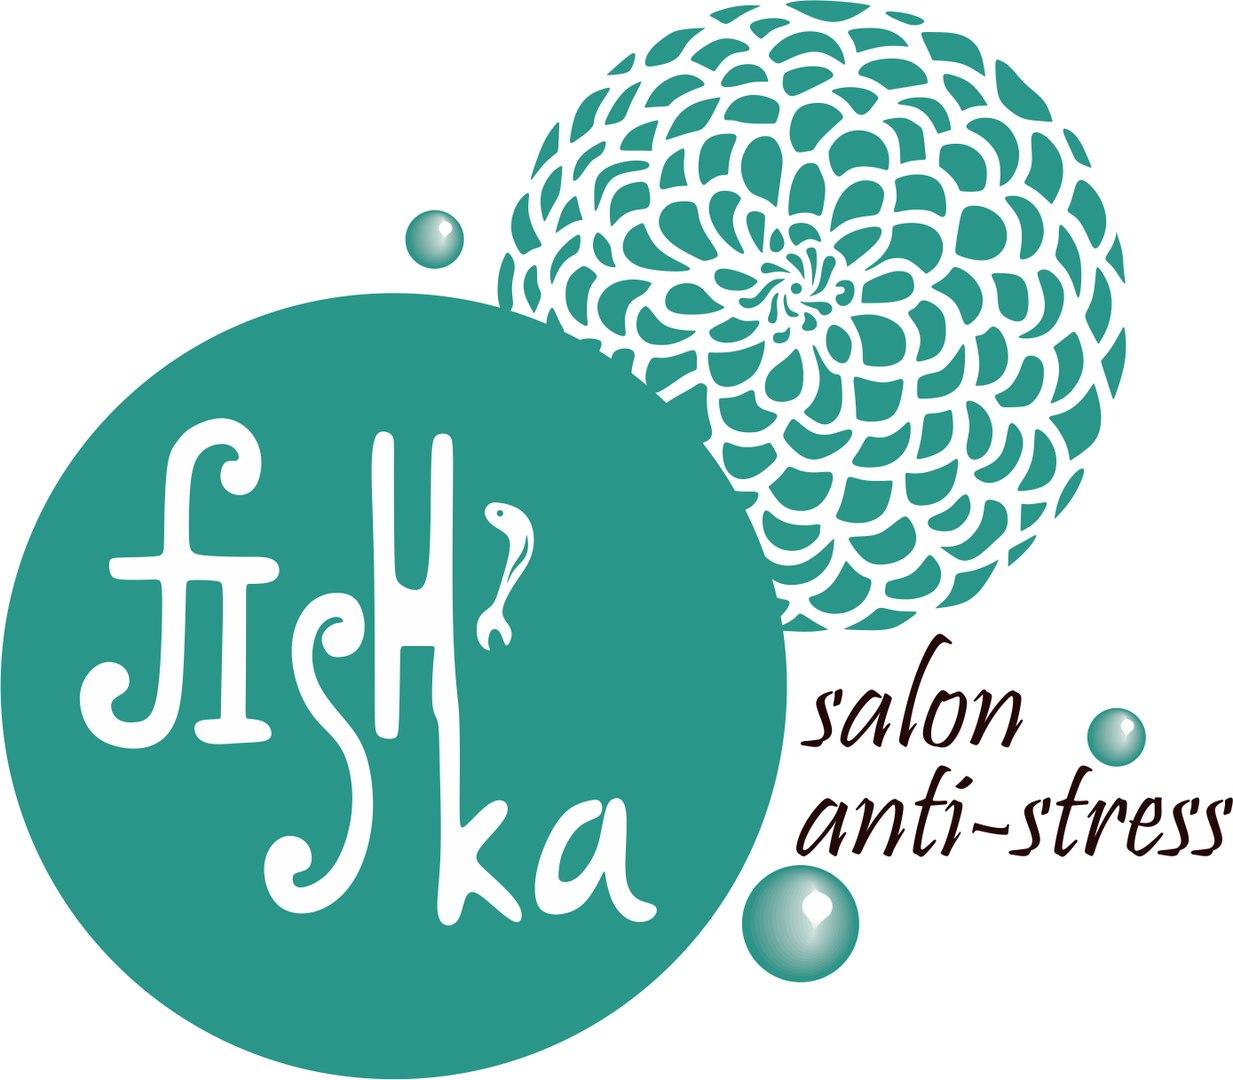 FISH'ка, студия антистрессовых процедур в Кургане афиша курган